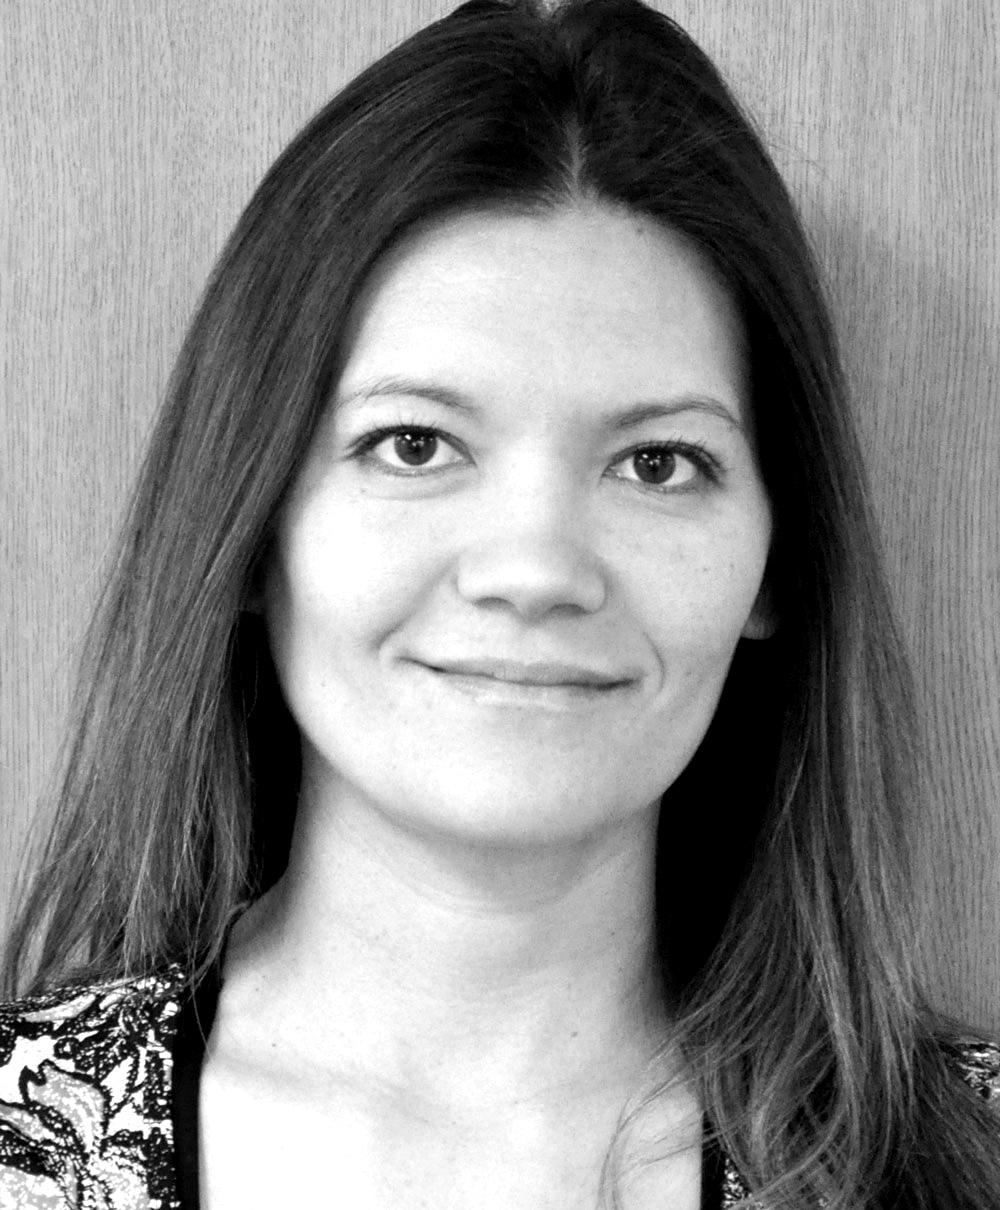 Headshot of Lydia La Point